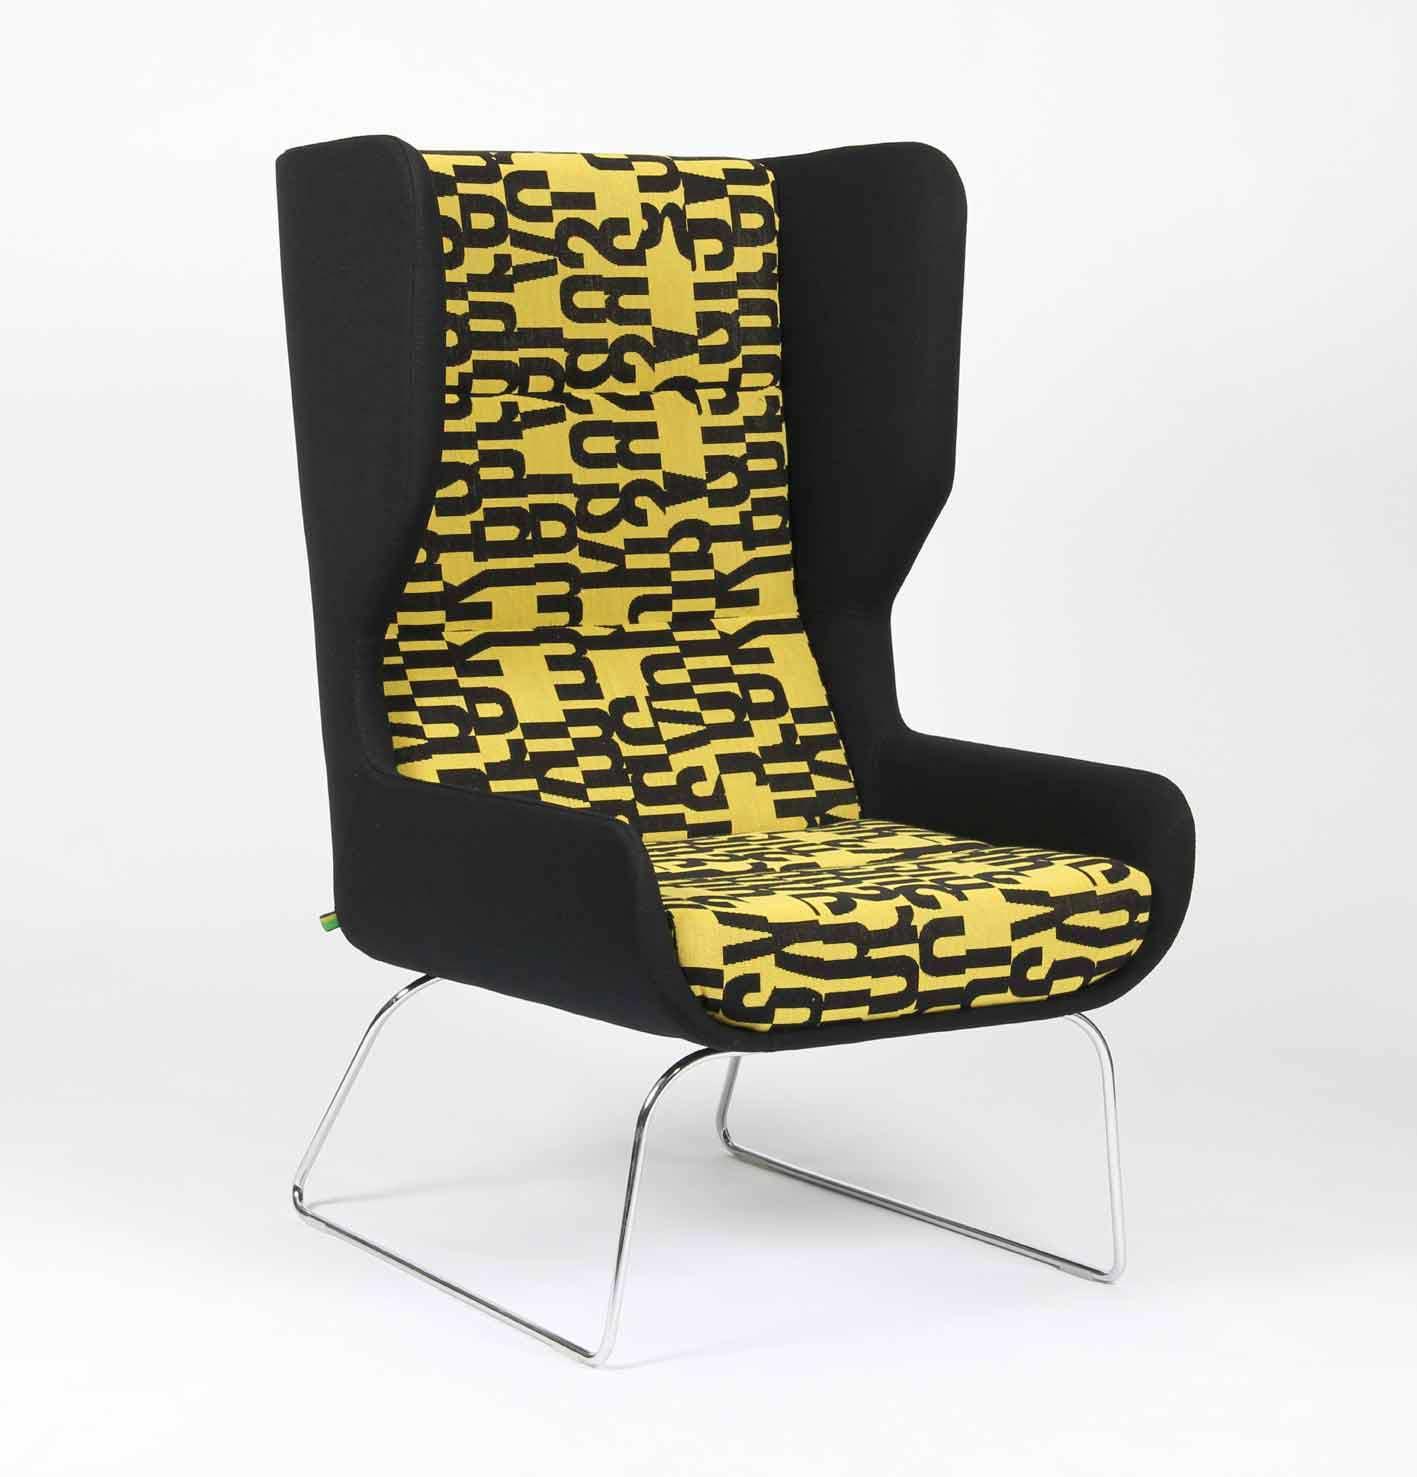 ergonomic chair request letter and a half swivel rocker recliner hush richardsons office furniture supplies